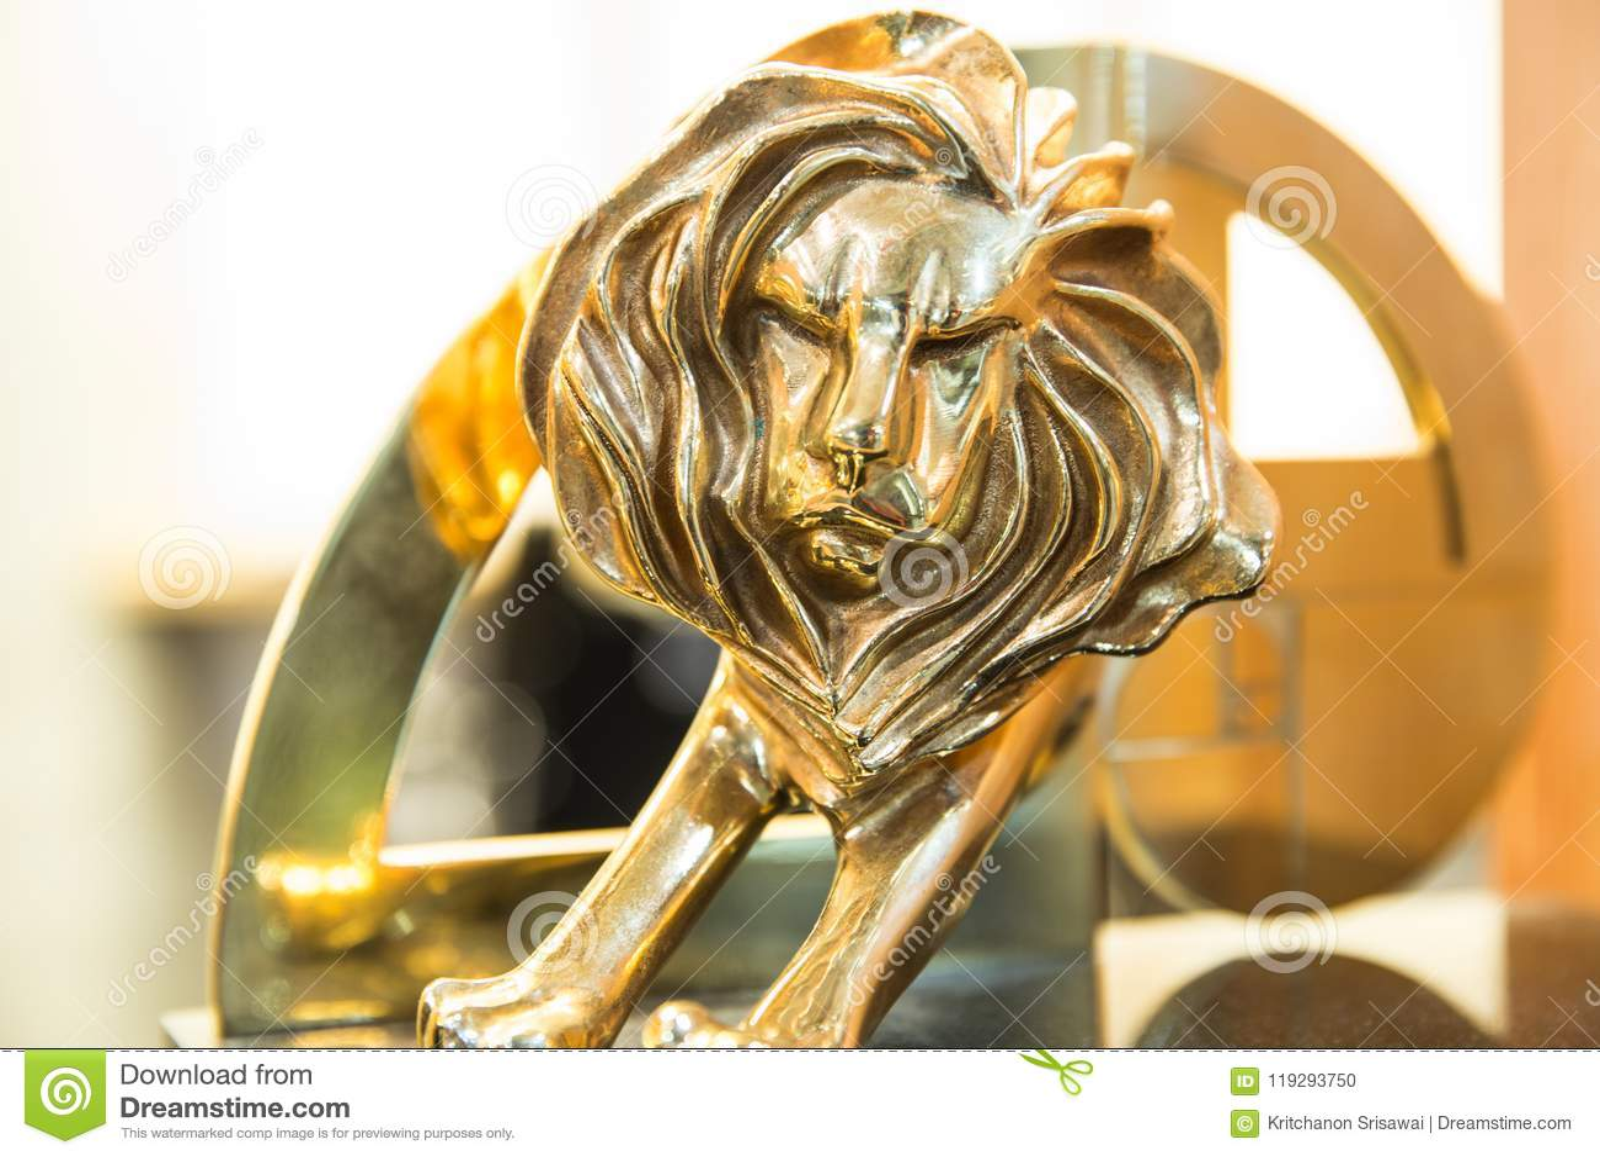 Nahaufnahme der Gold-Cannes-Löwetrophäe, Trieb an Cannes-Löwen festiv